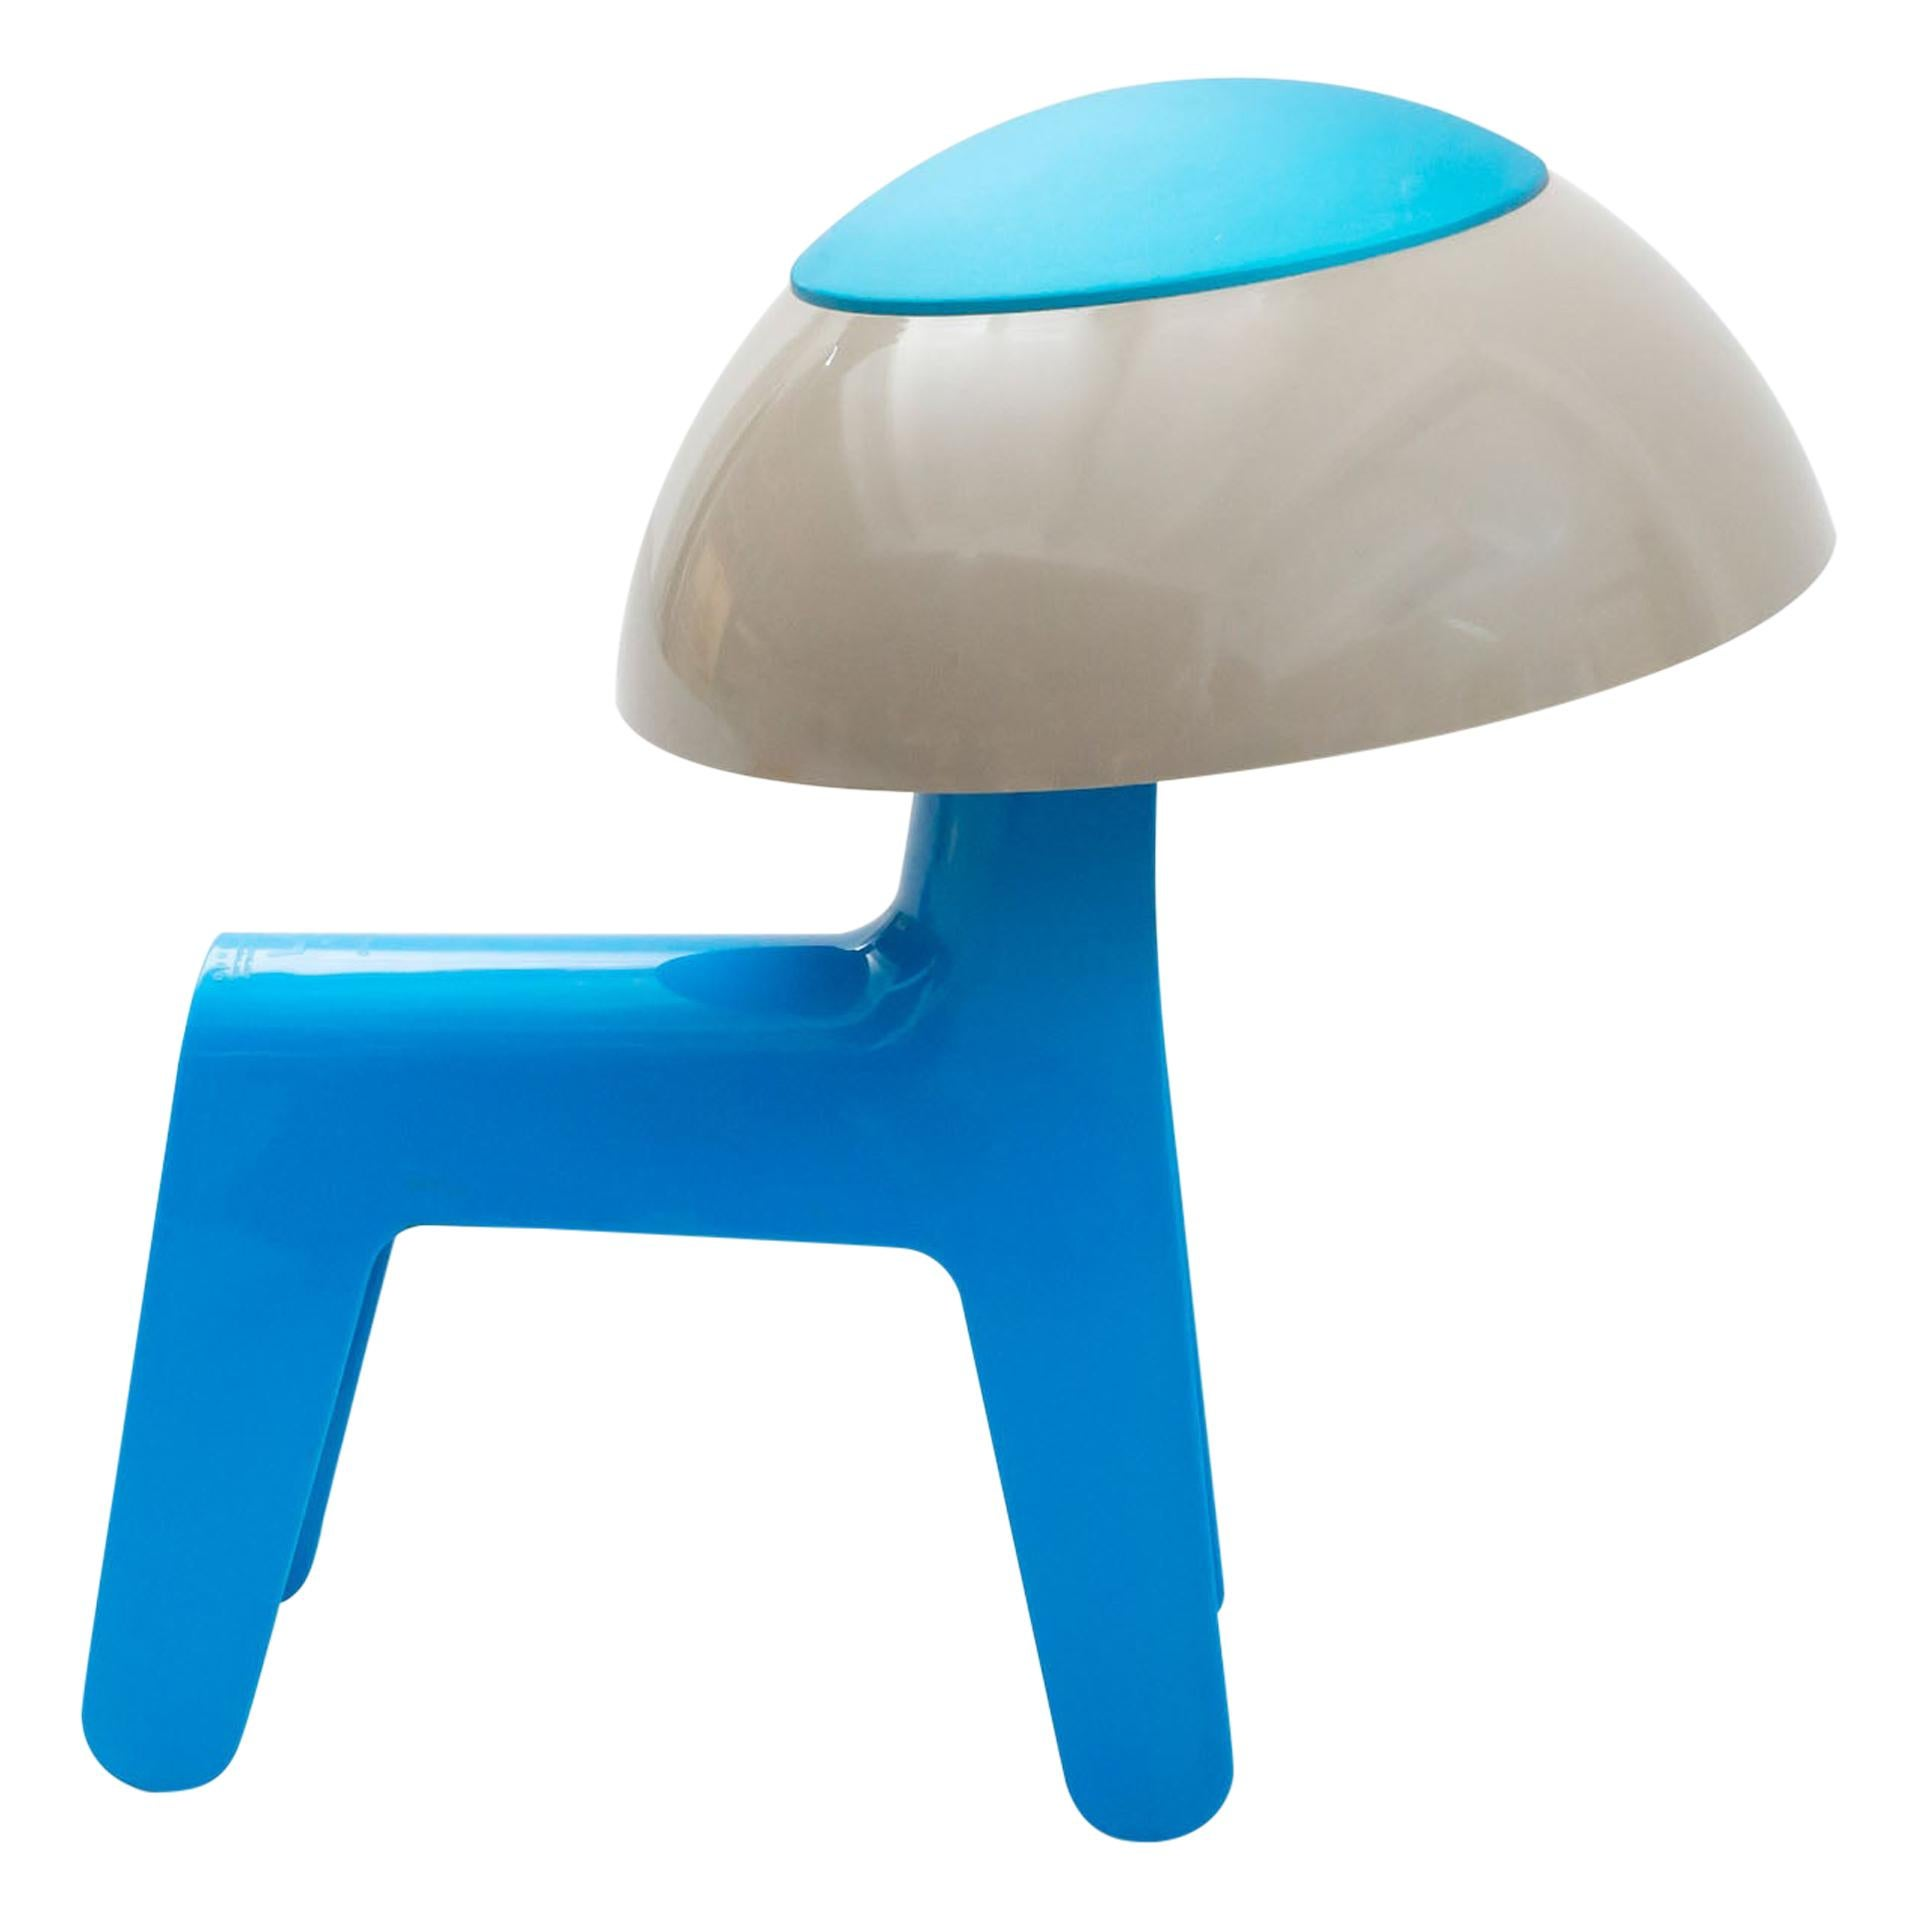 Studio Propaganda 'Doglamp' Table or Floor Lamp, circa 2000